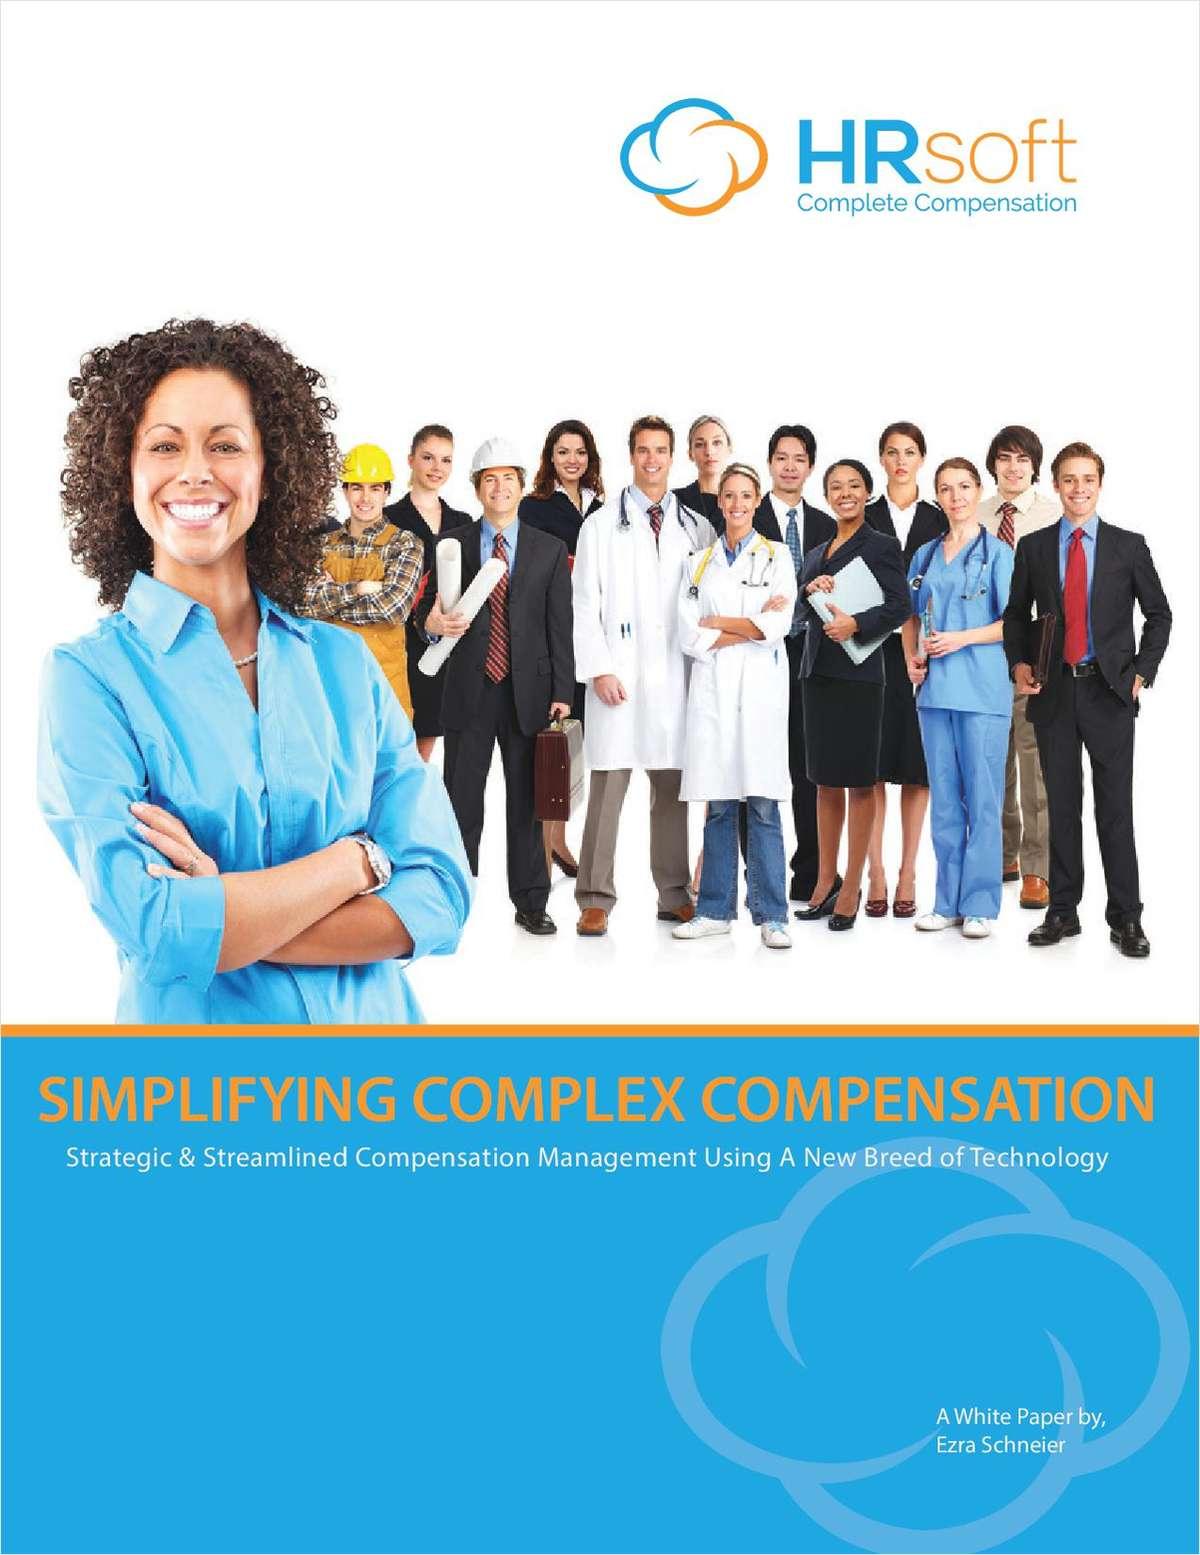 Simplifying Complex Compensation